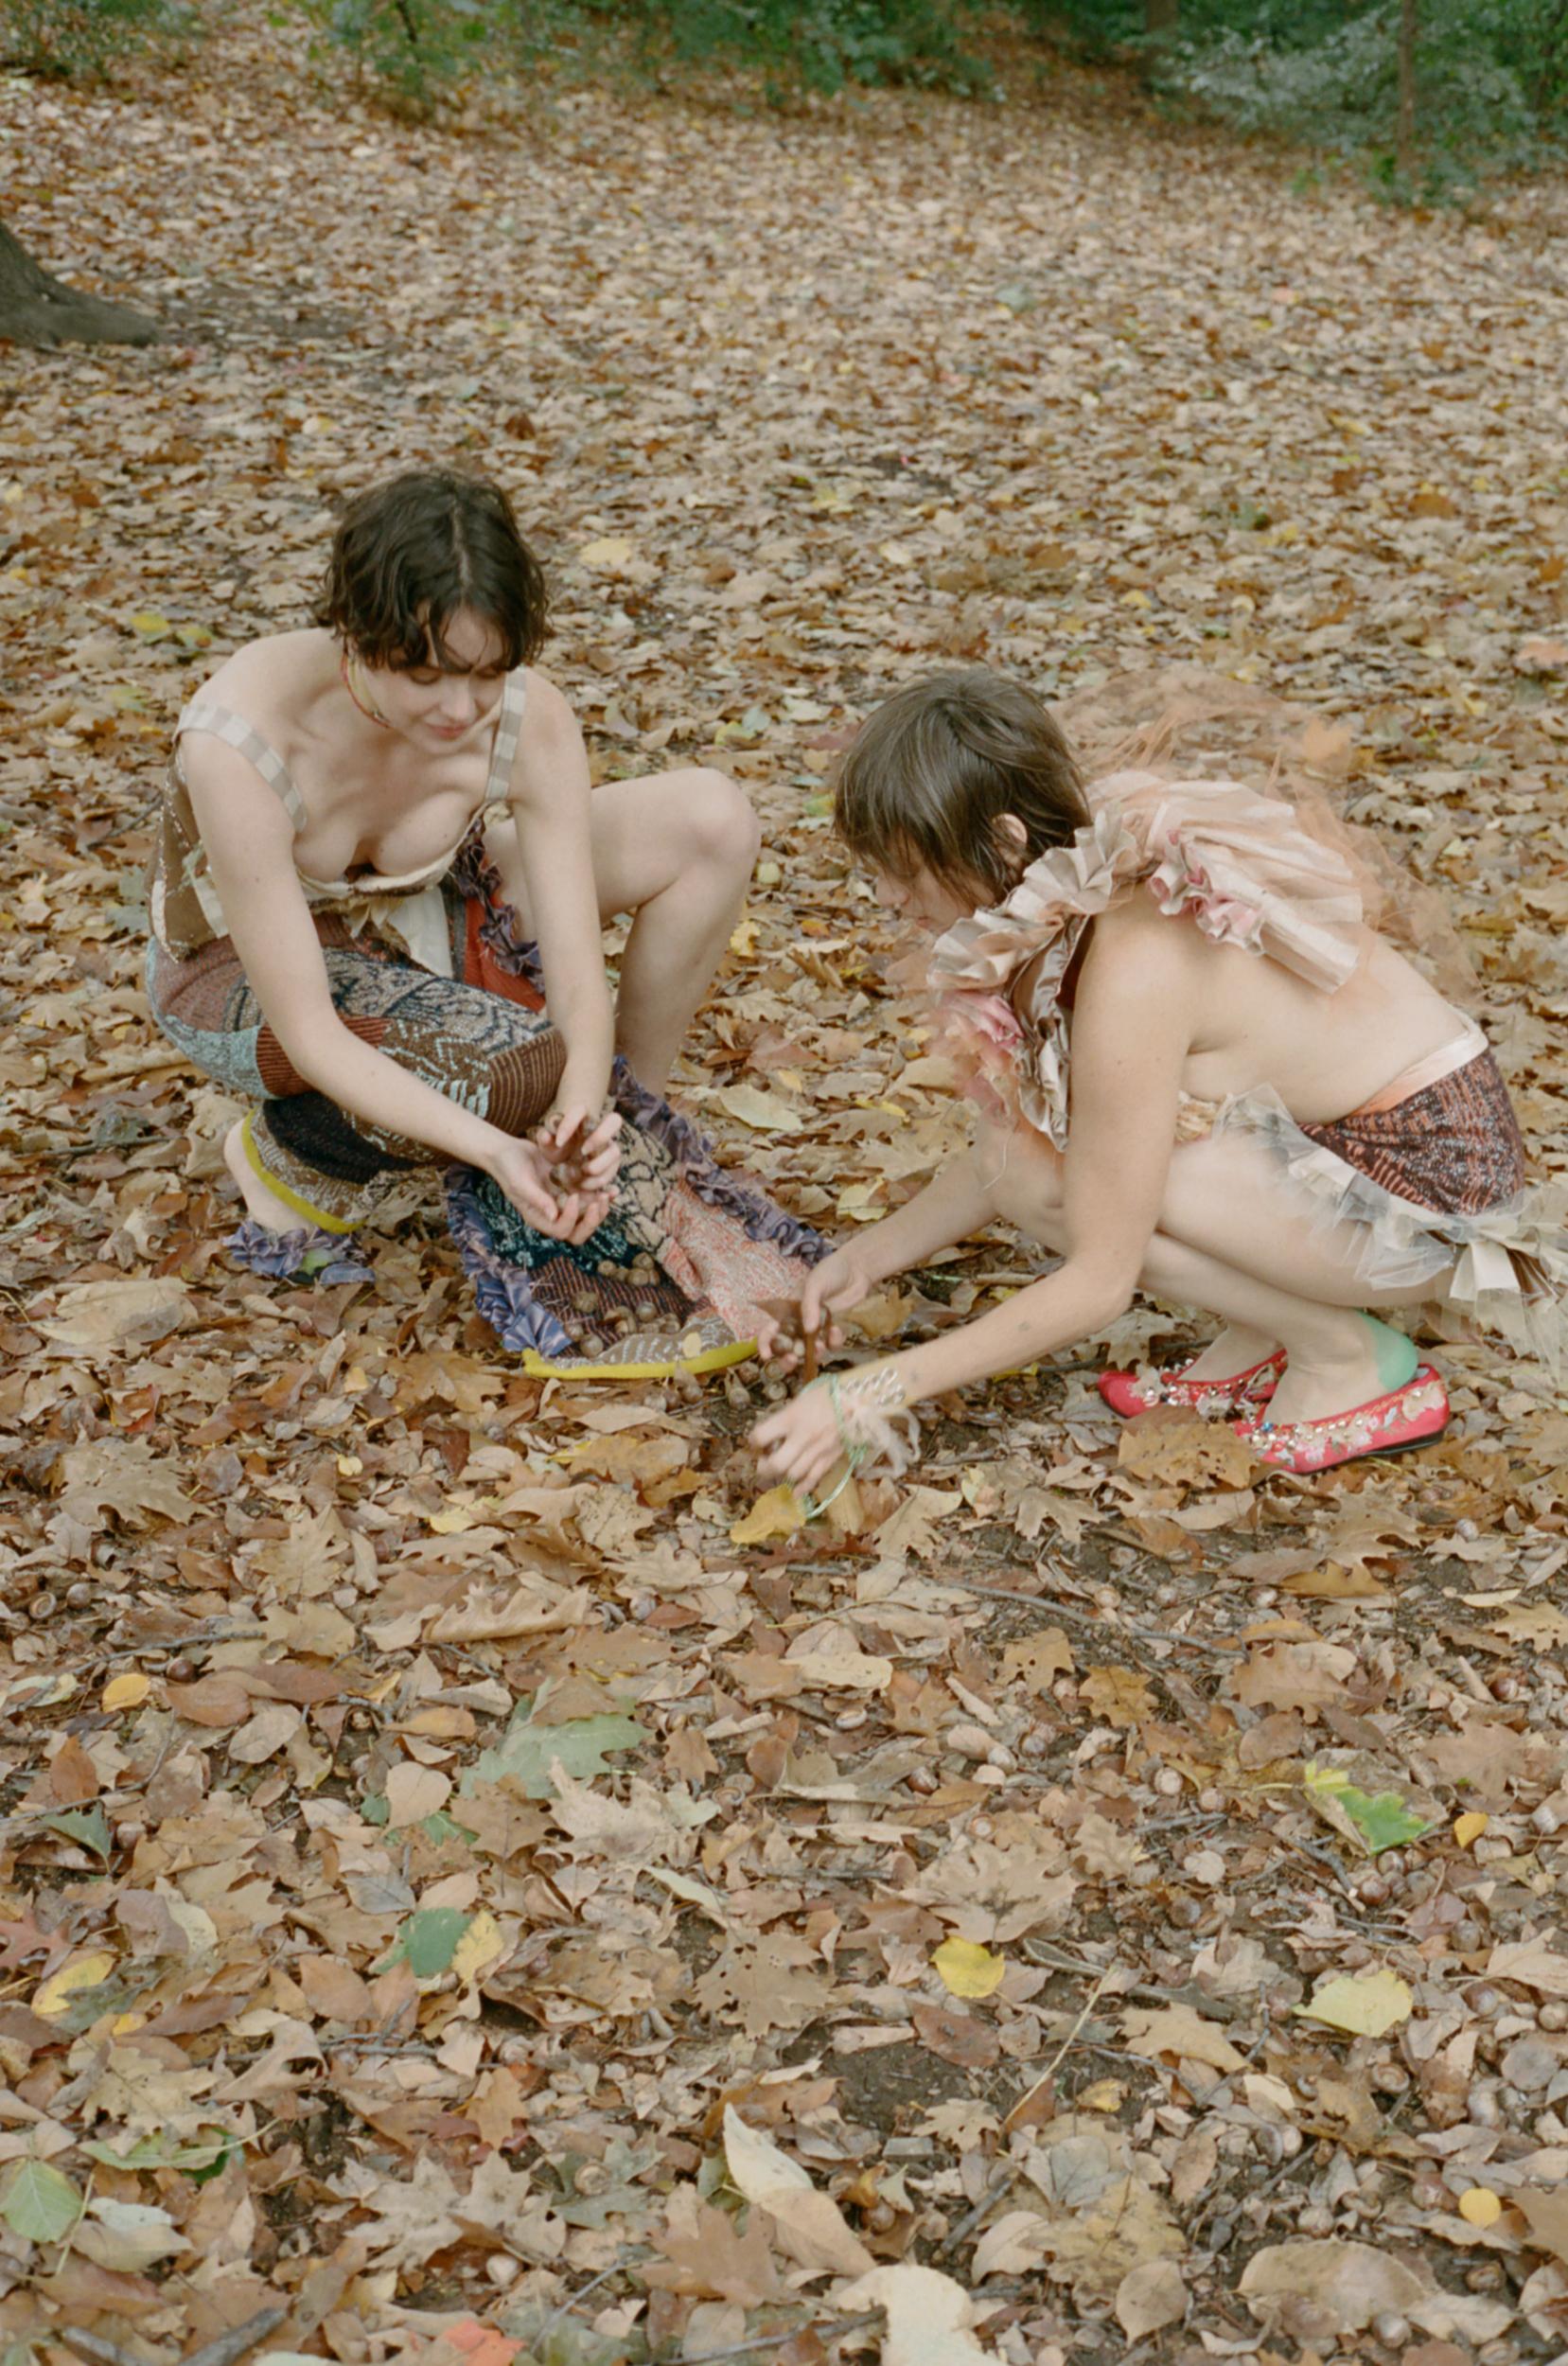 leahpipesmeltzer_for_novembremagazine_loudallas_josefineseifert_4_2.jpg